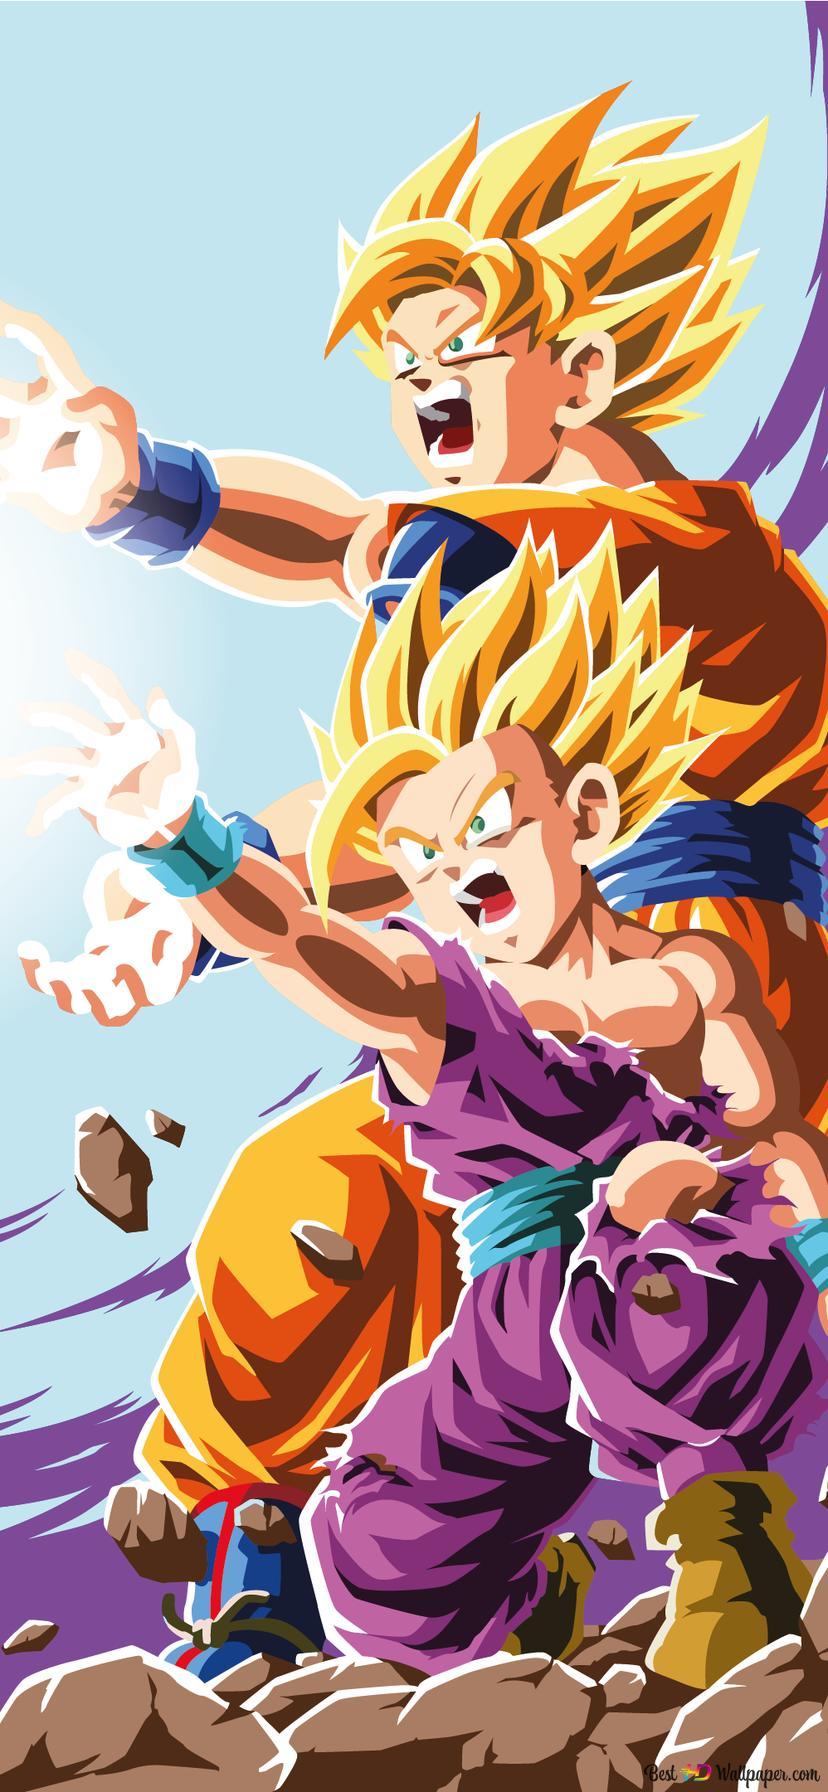 Dragon Ball Z Gohan Goku Hd Wallpaper Download